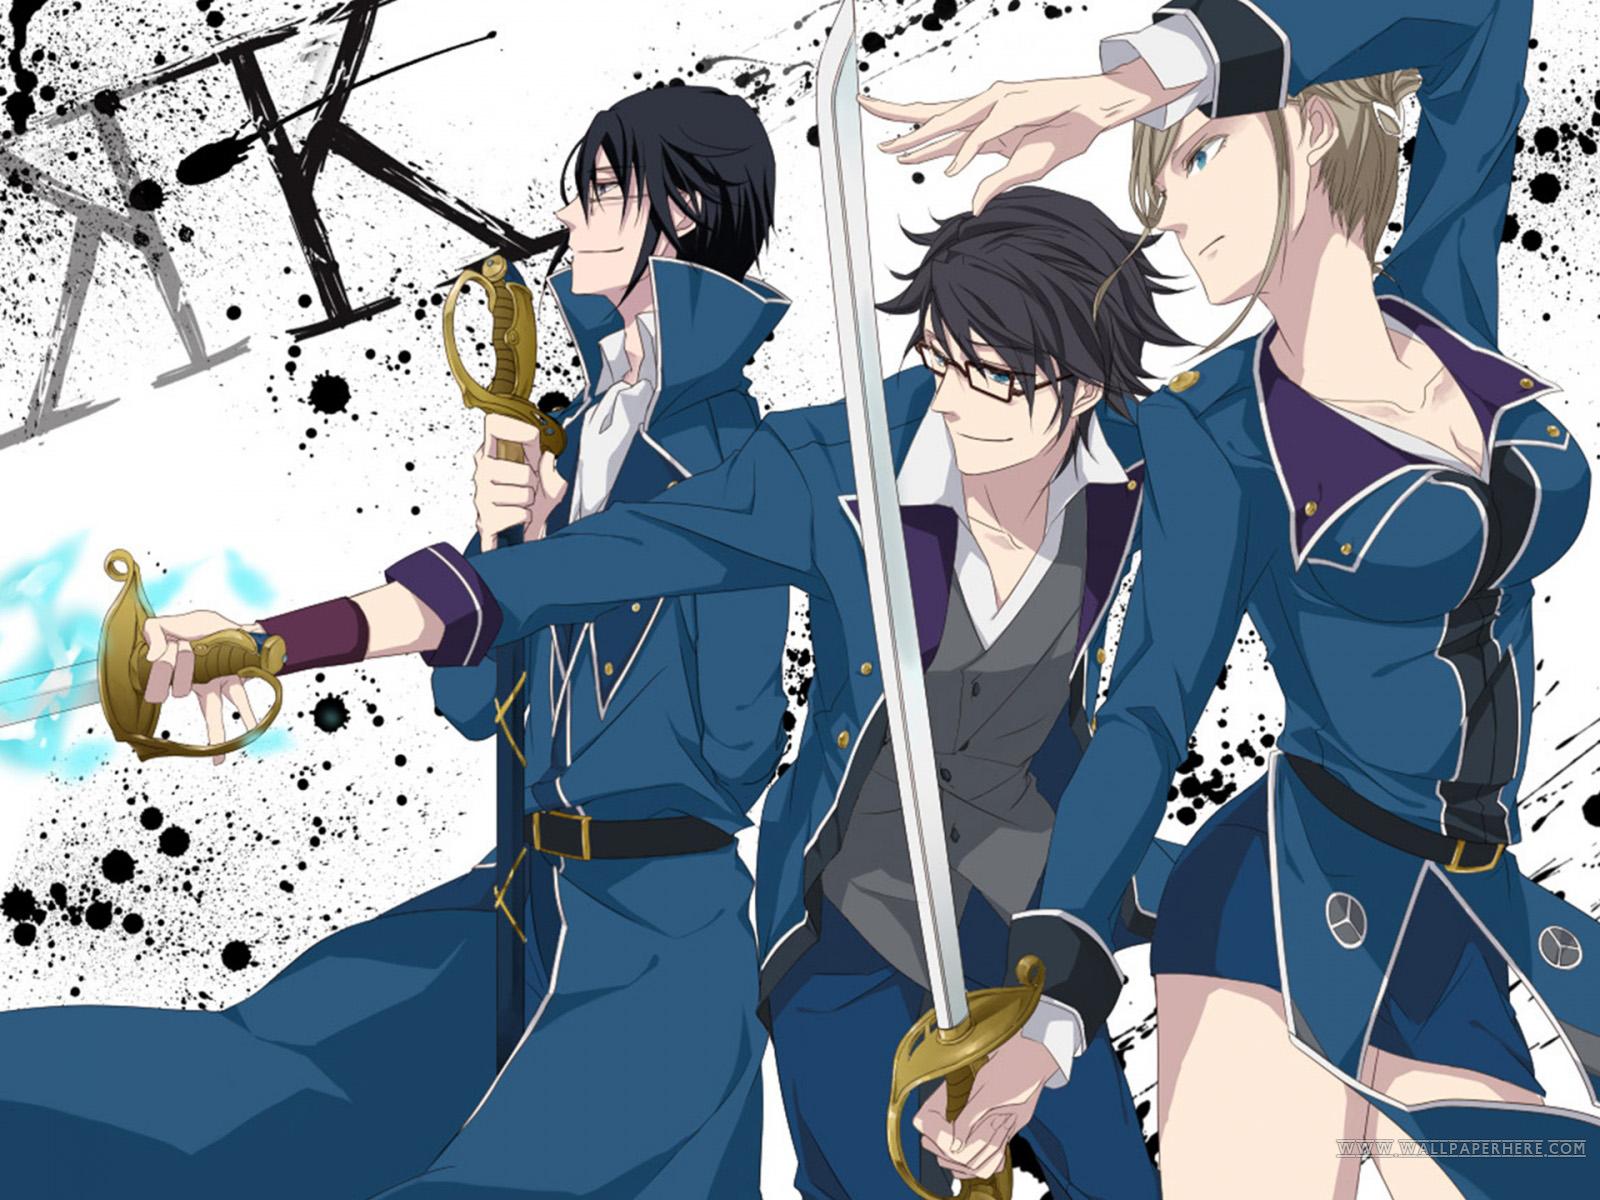 Project sword anime hd wallpaper desktop pc background 0002 1600x1200